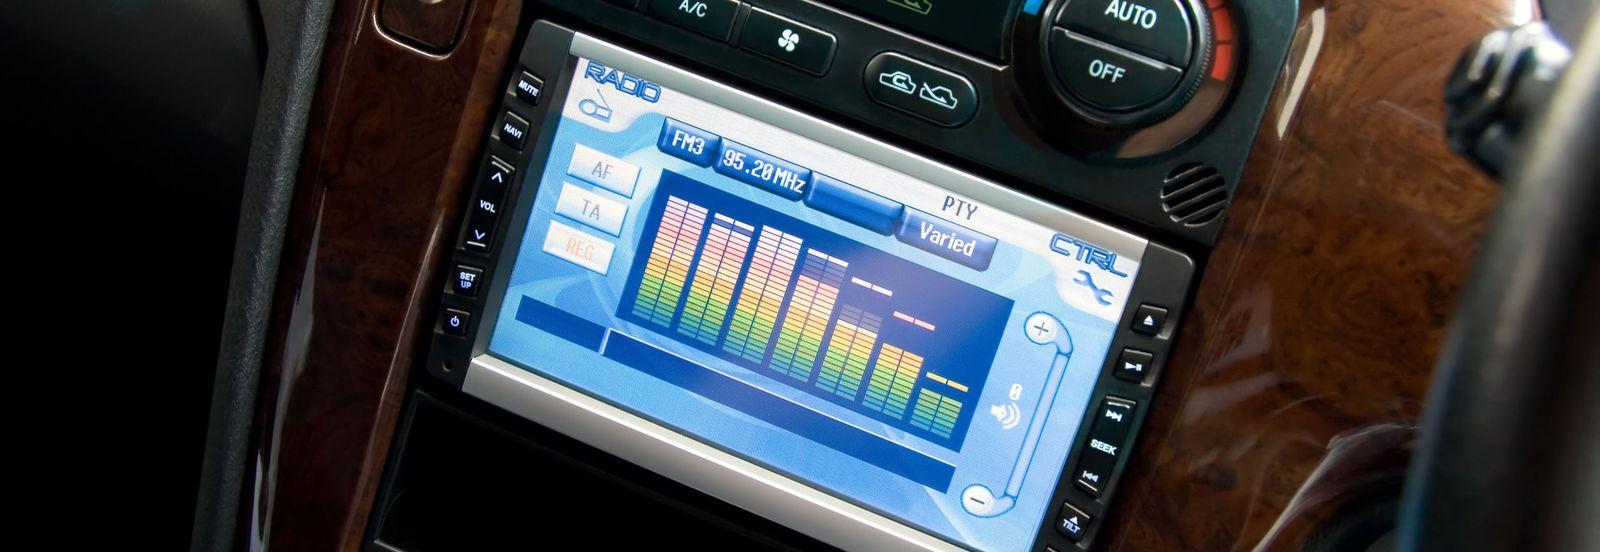 CAR AUDIO SERVICES